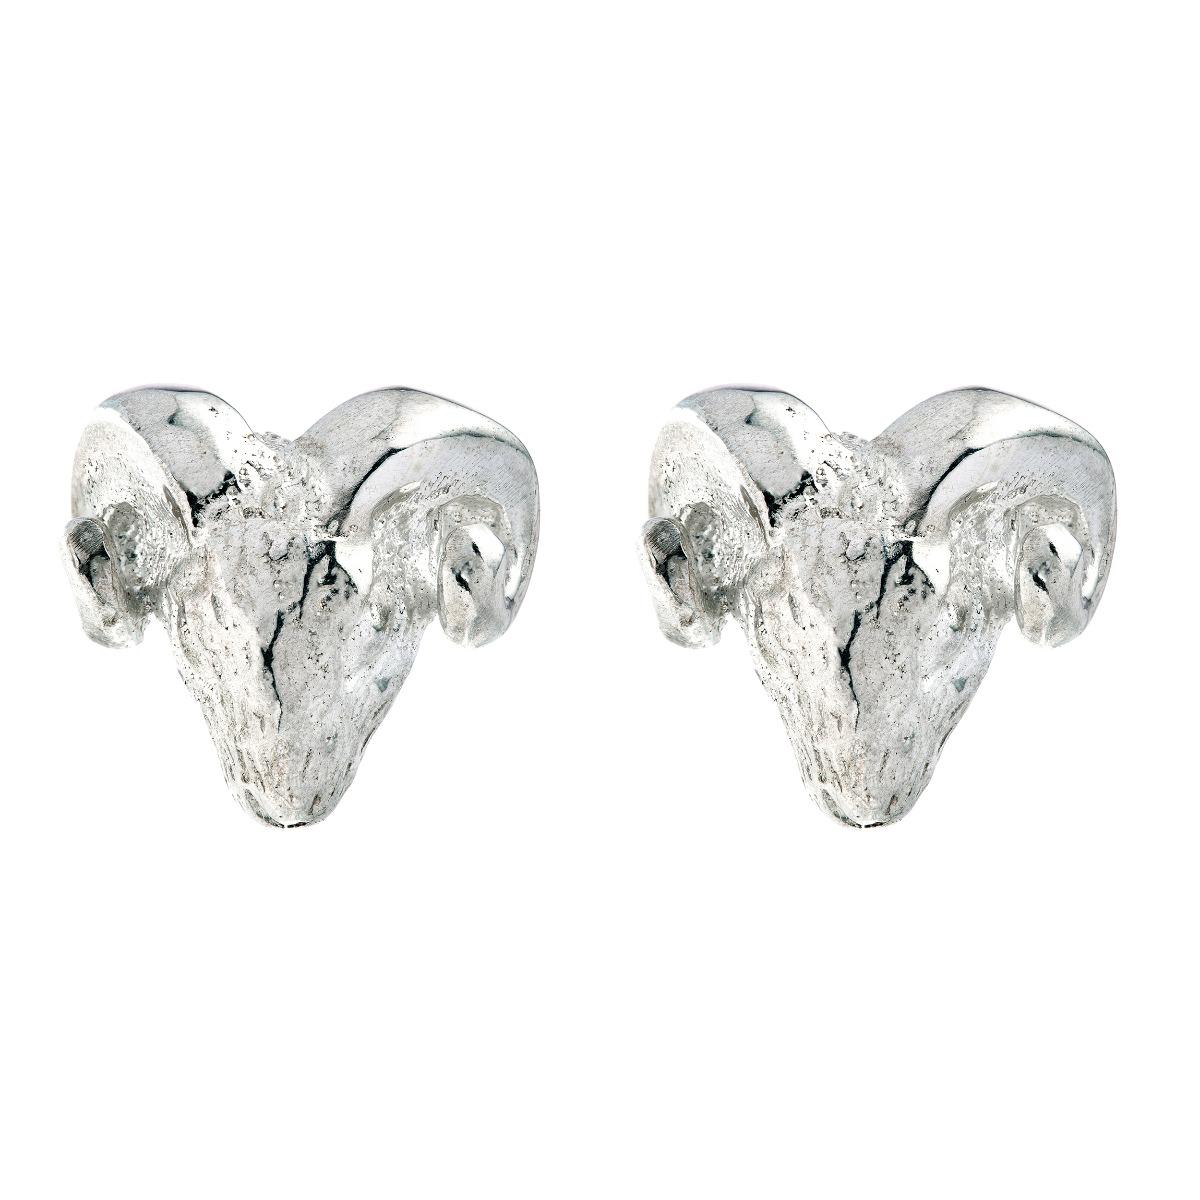 Chinese zodiac stud earrings (goat)